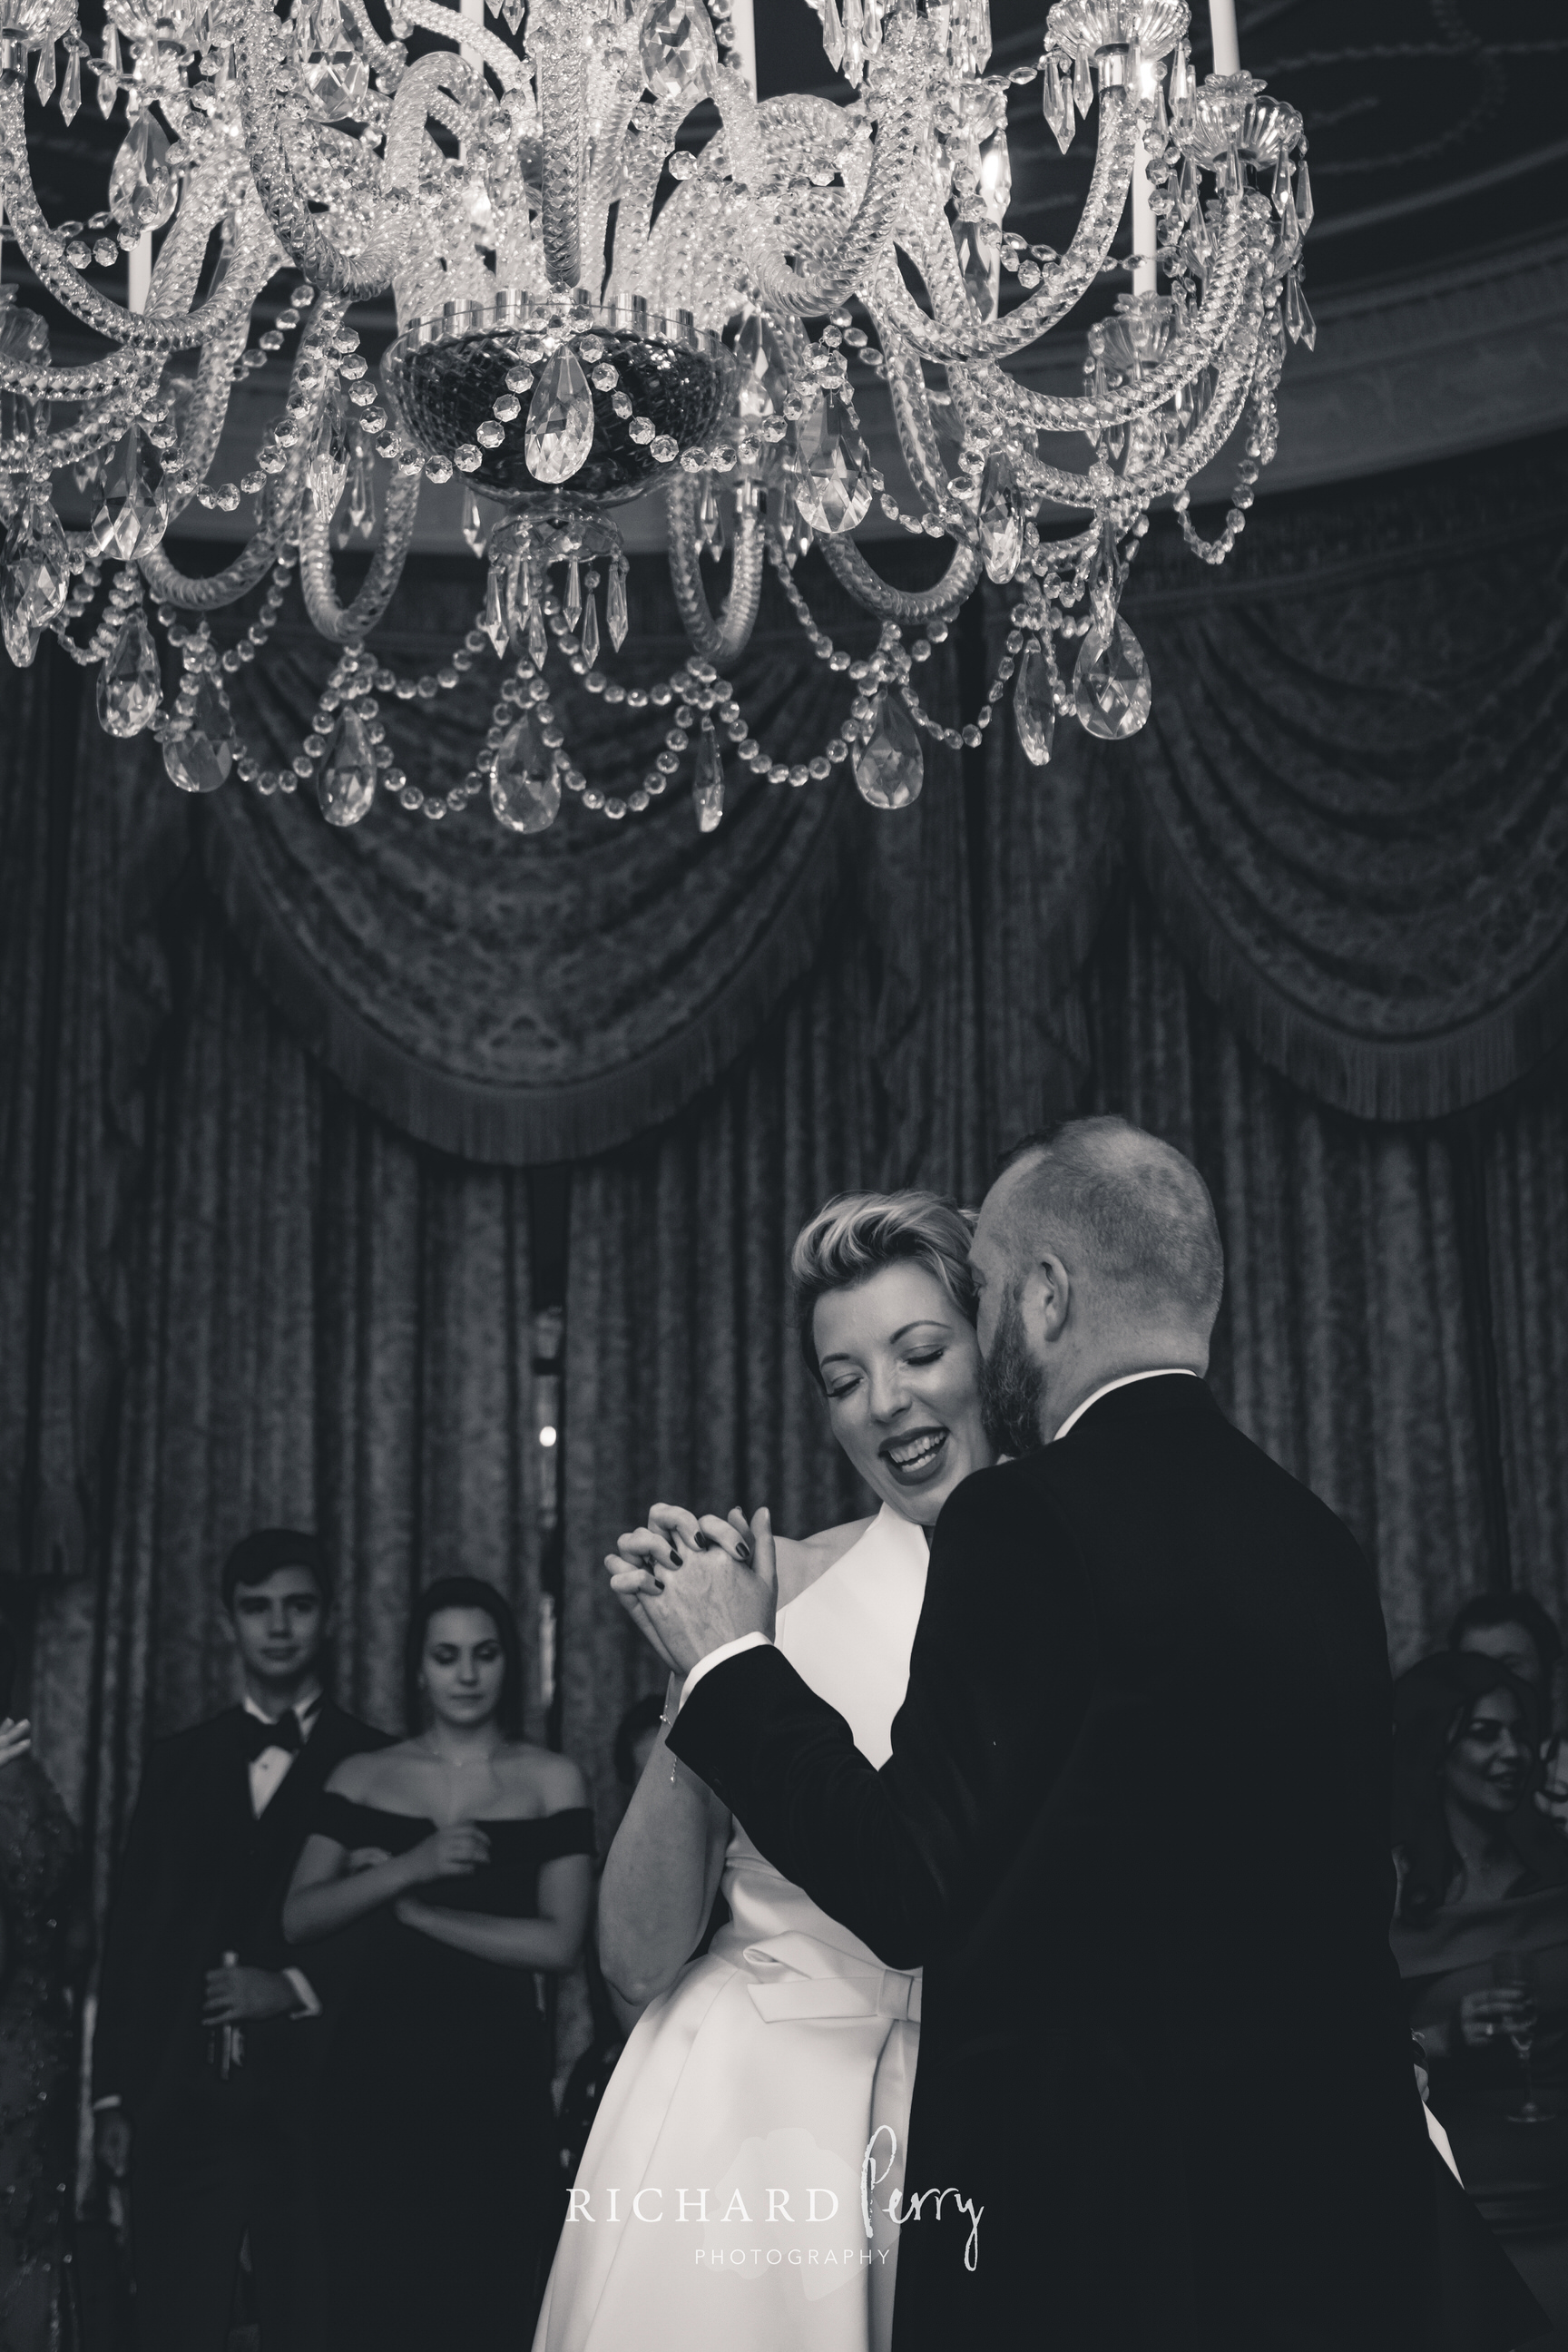 yorkshire-wedding-photographer-destination-archerfield-house-26.jpg